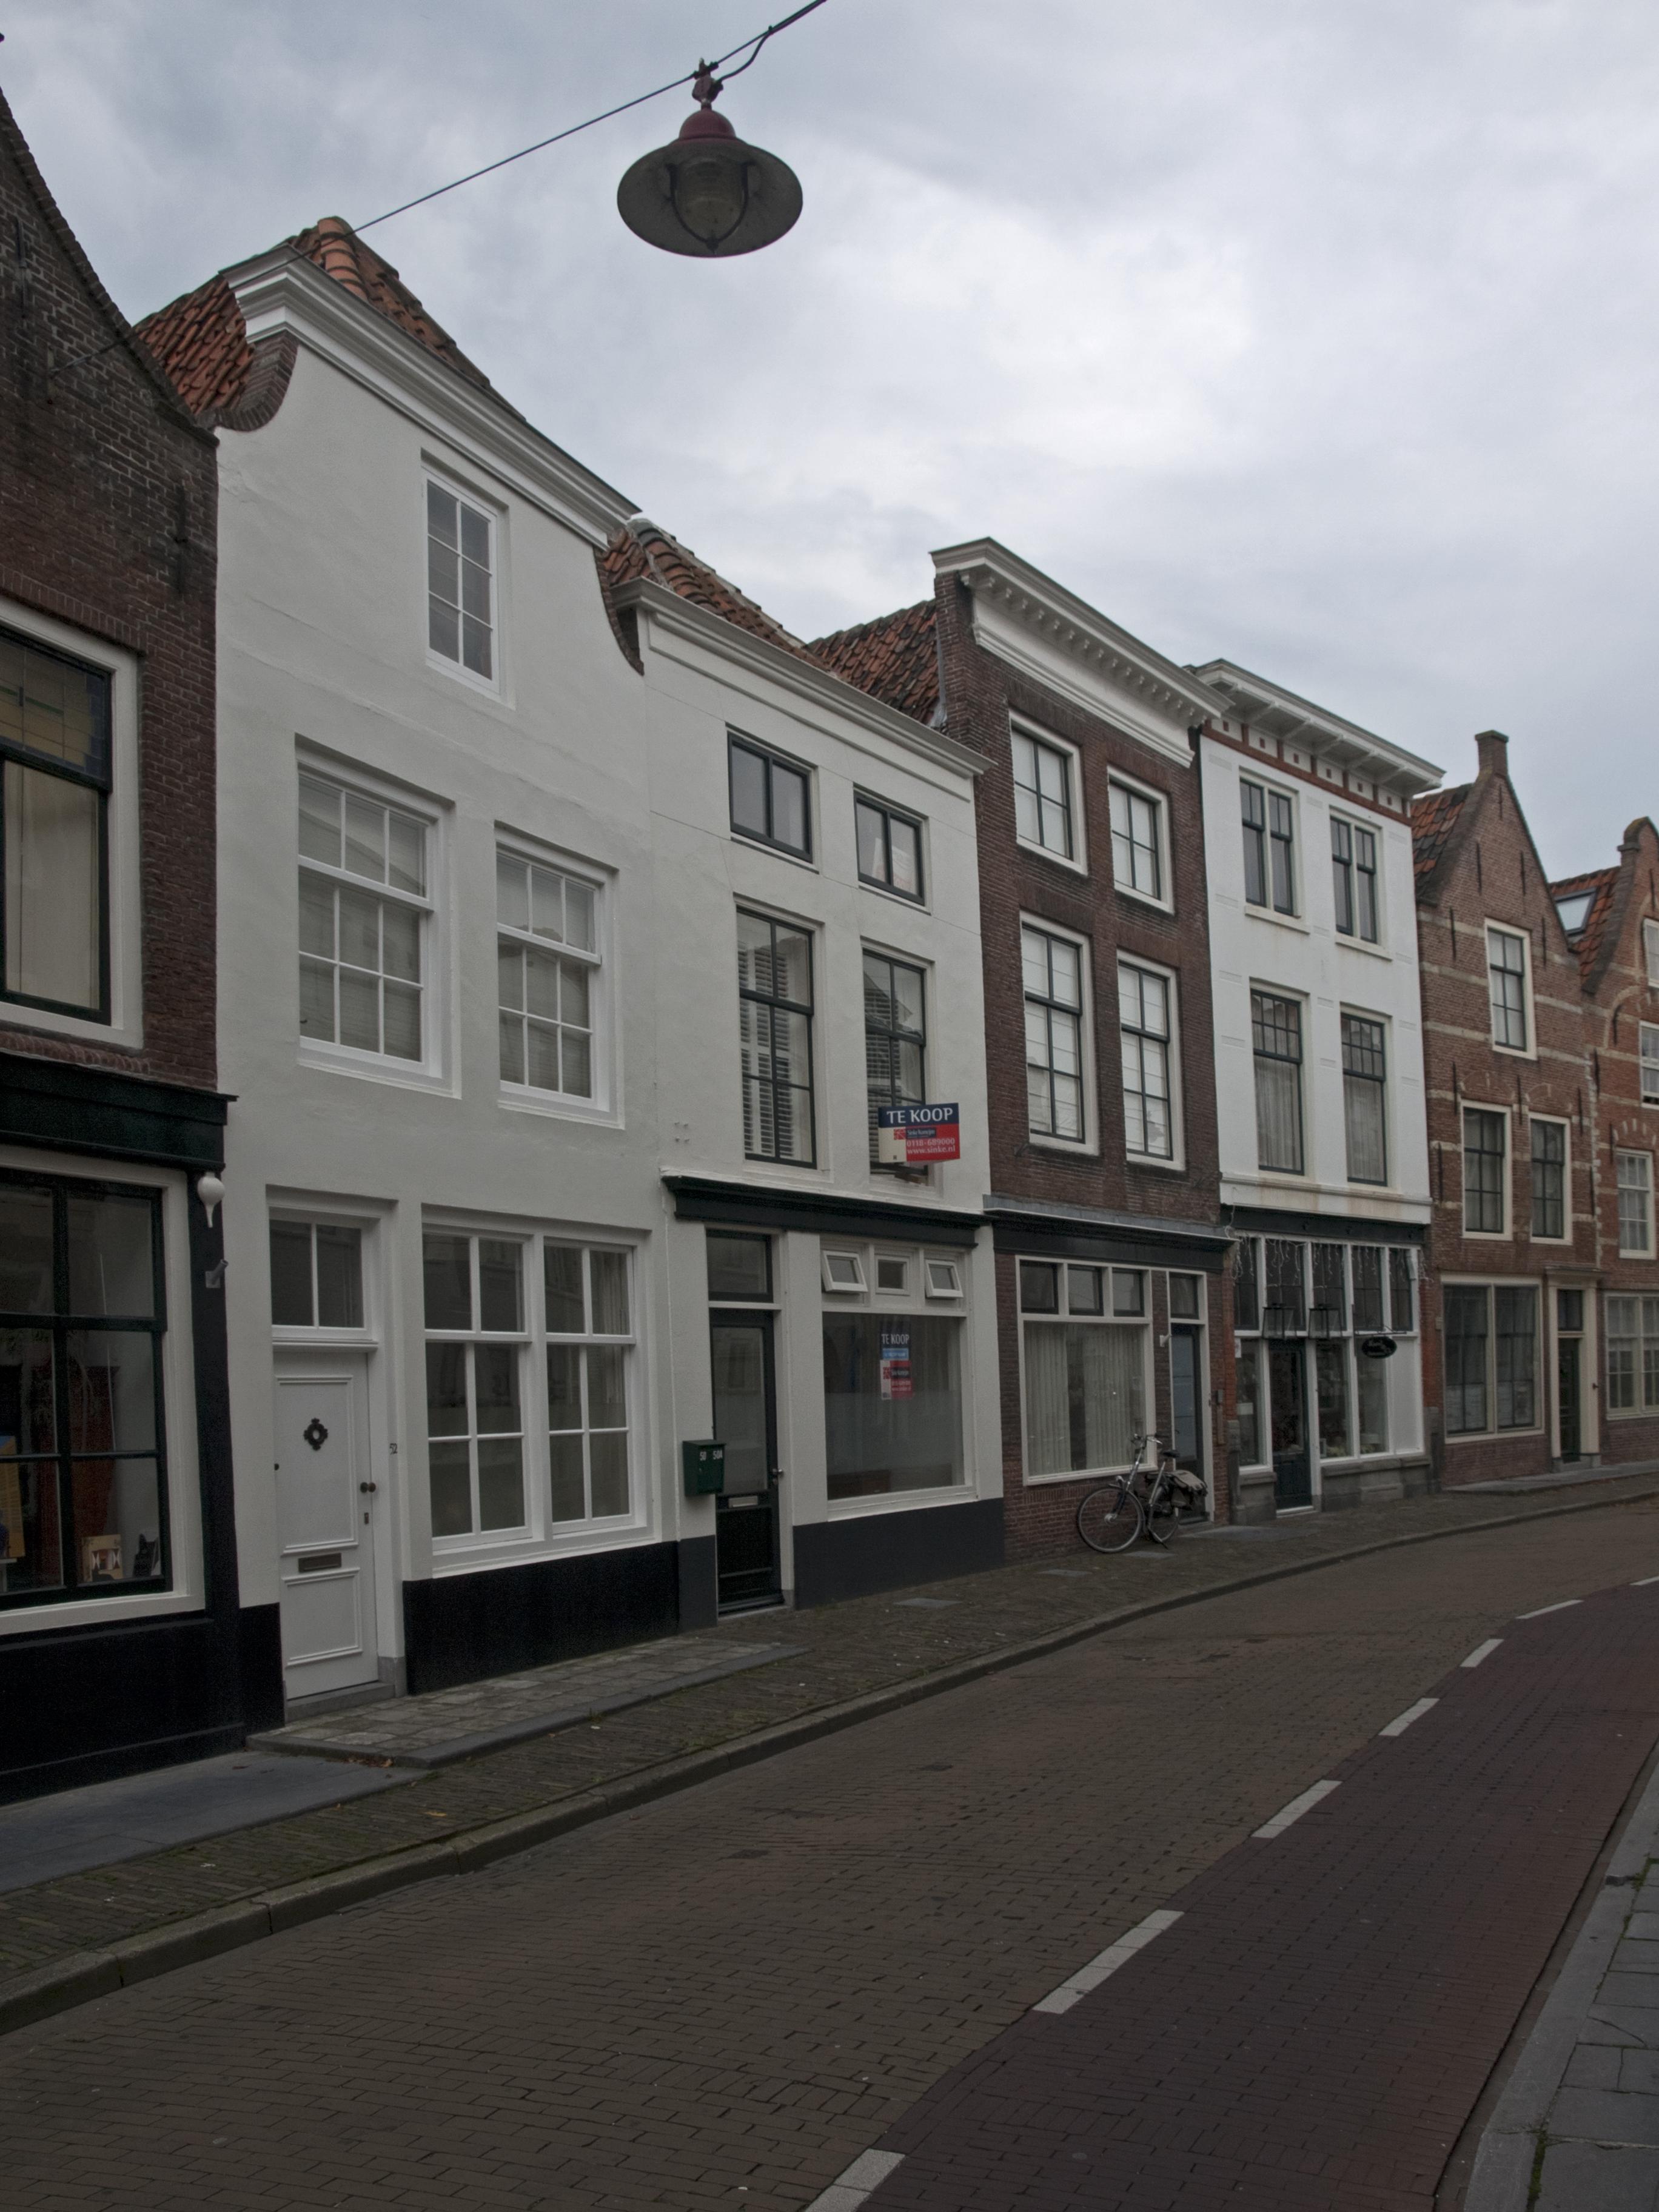 Huis met gepleisterde lijstgevel in middelburg monument - Foto huis in l ...